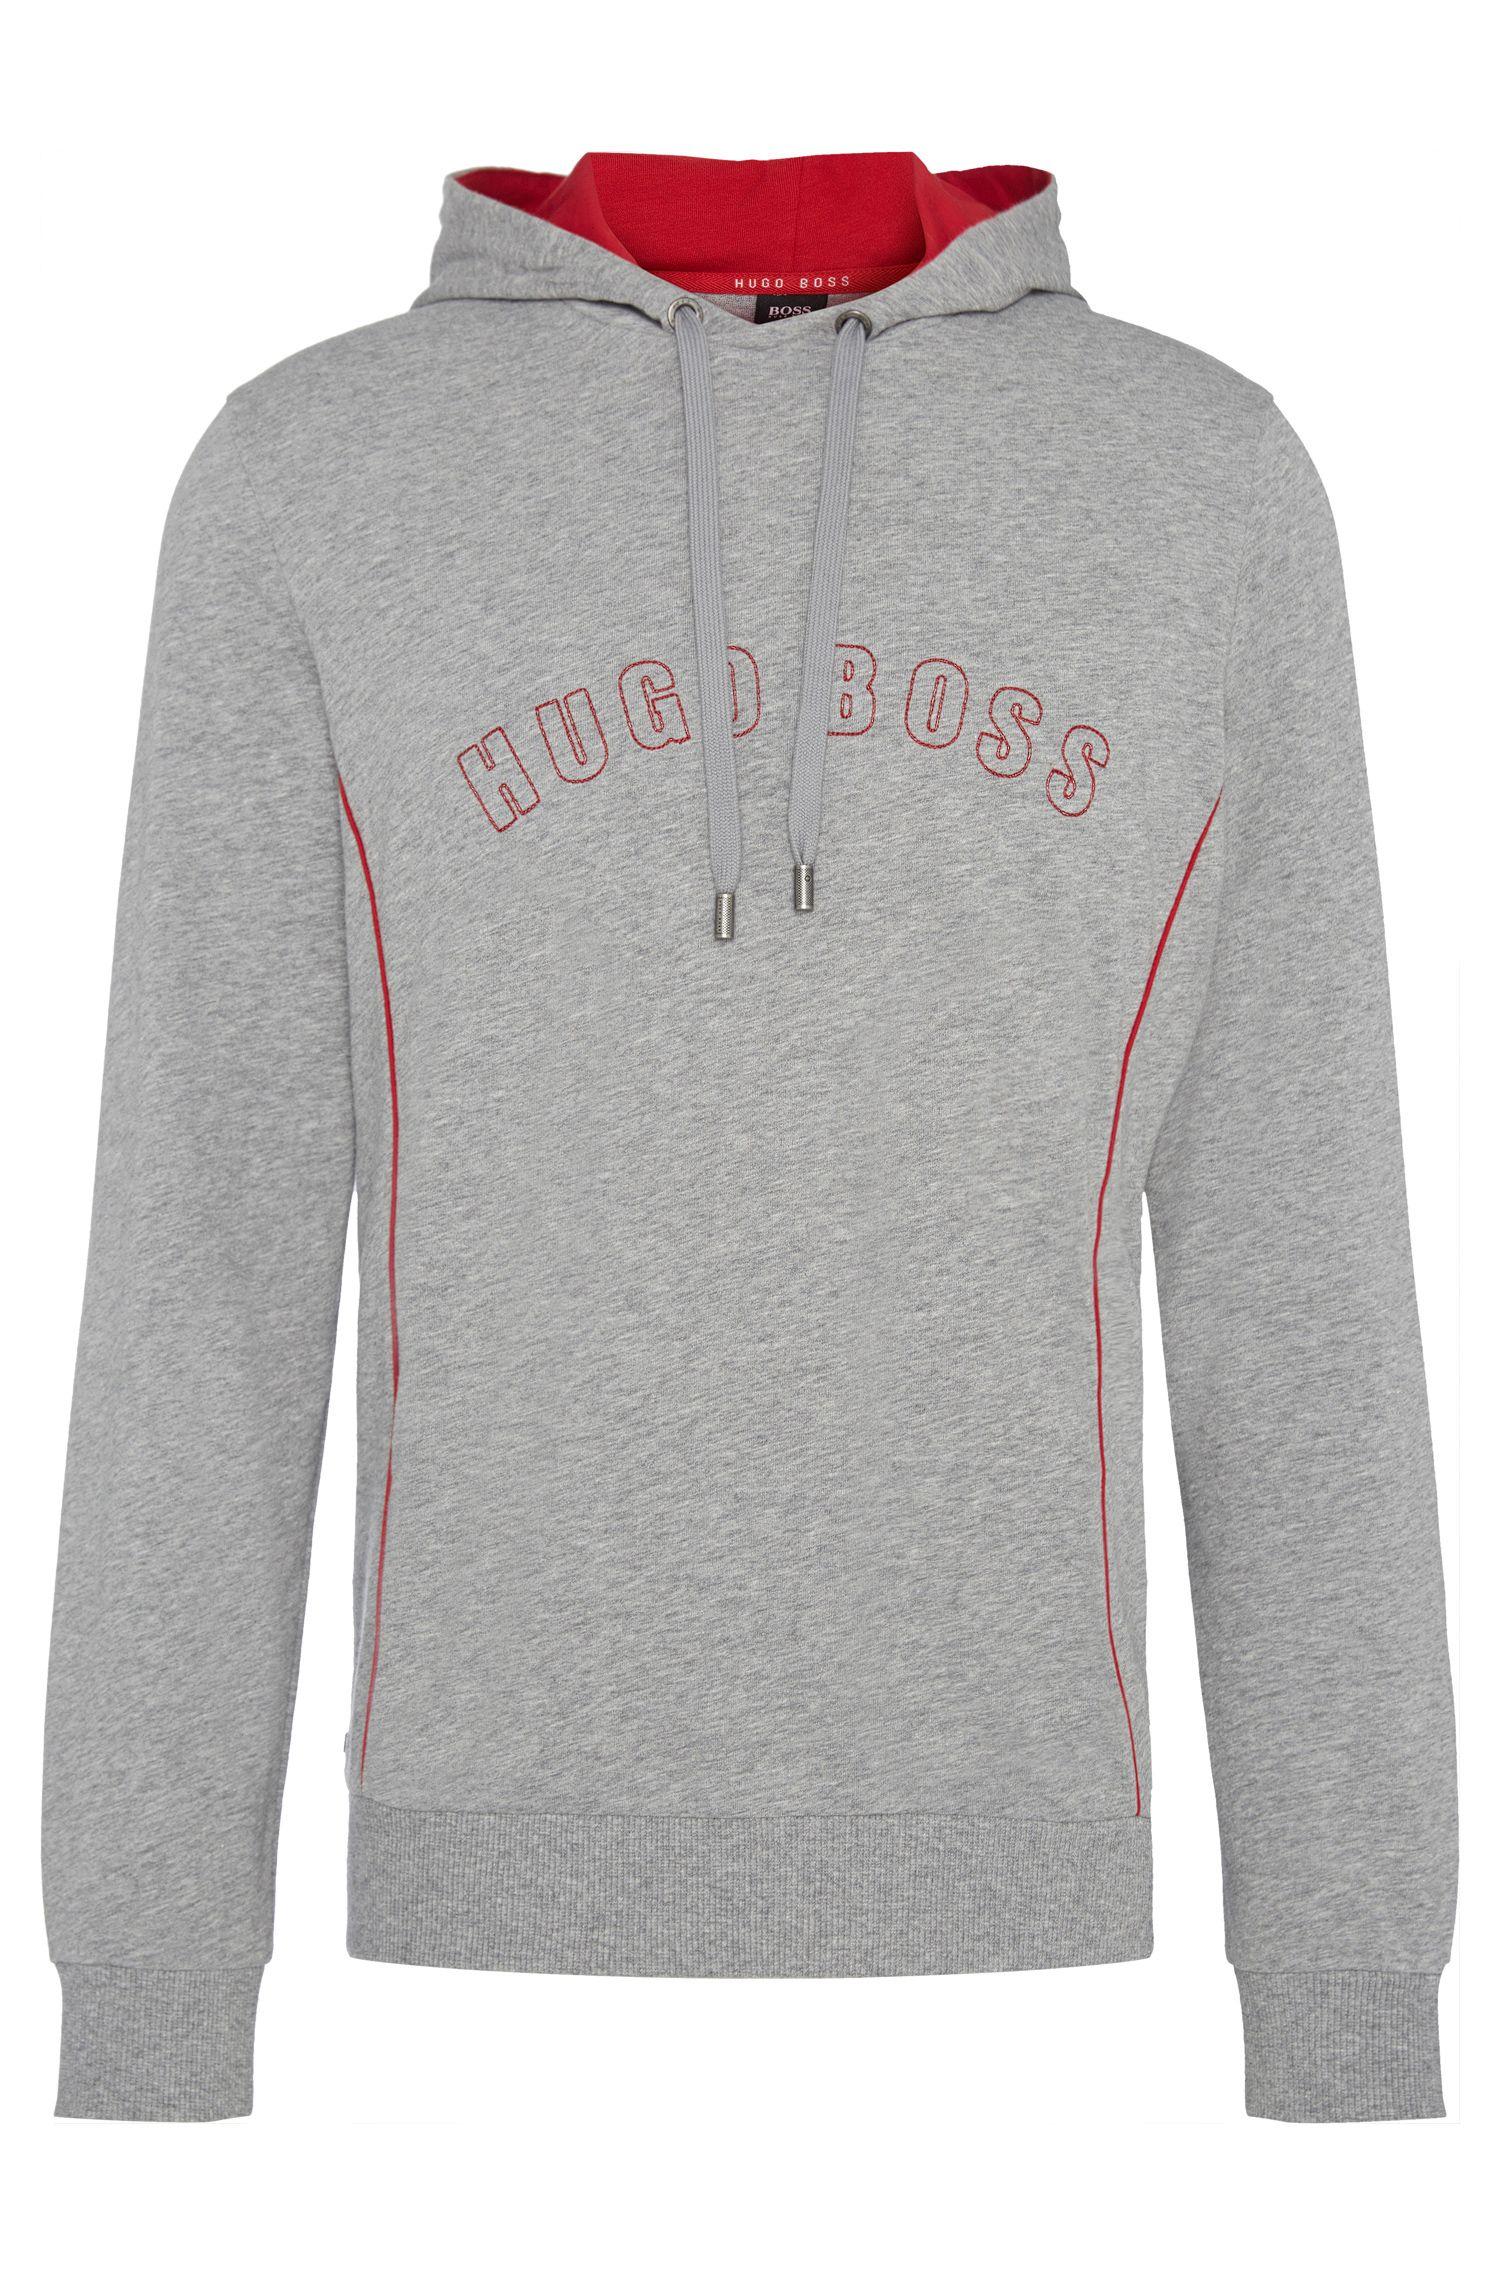 Regular-Fit Kapuzen-Sweatshirt aus Baumwolle: 'Hooded Sweatshirt'